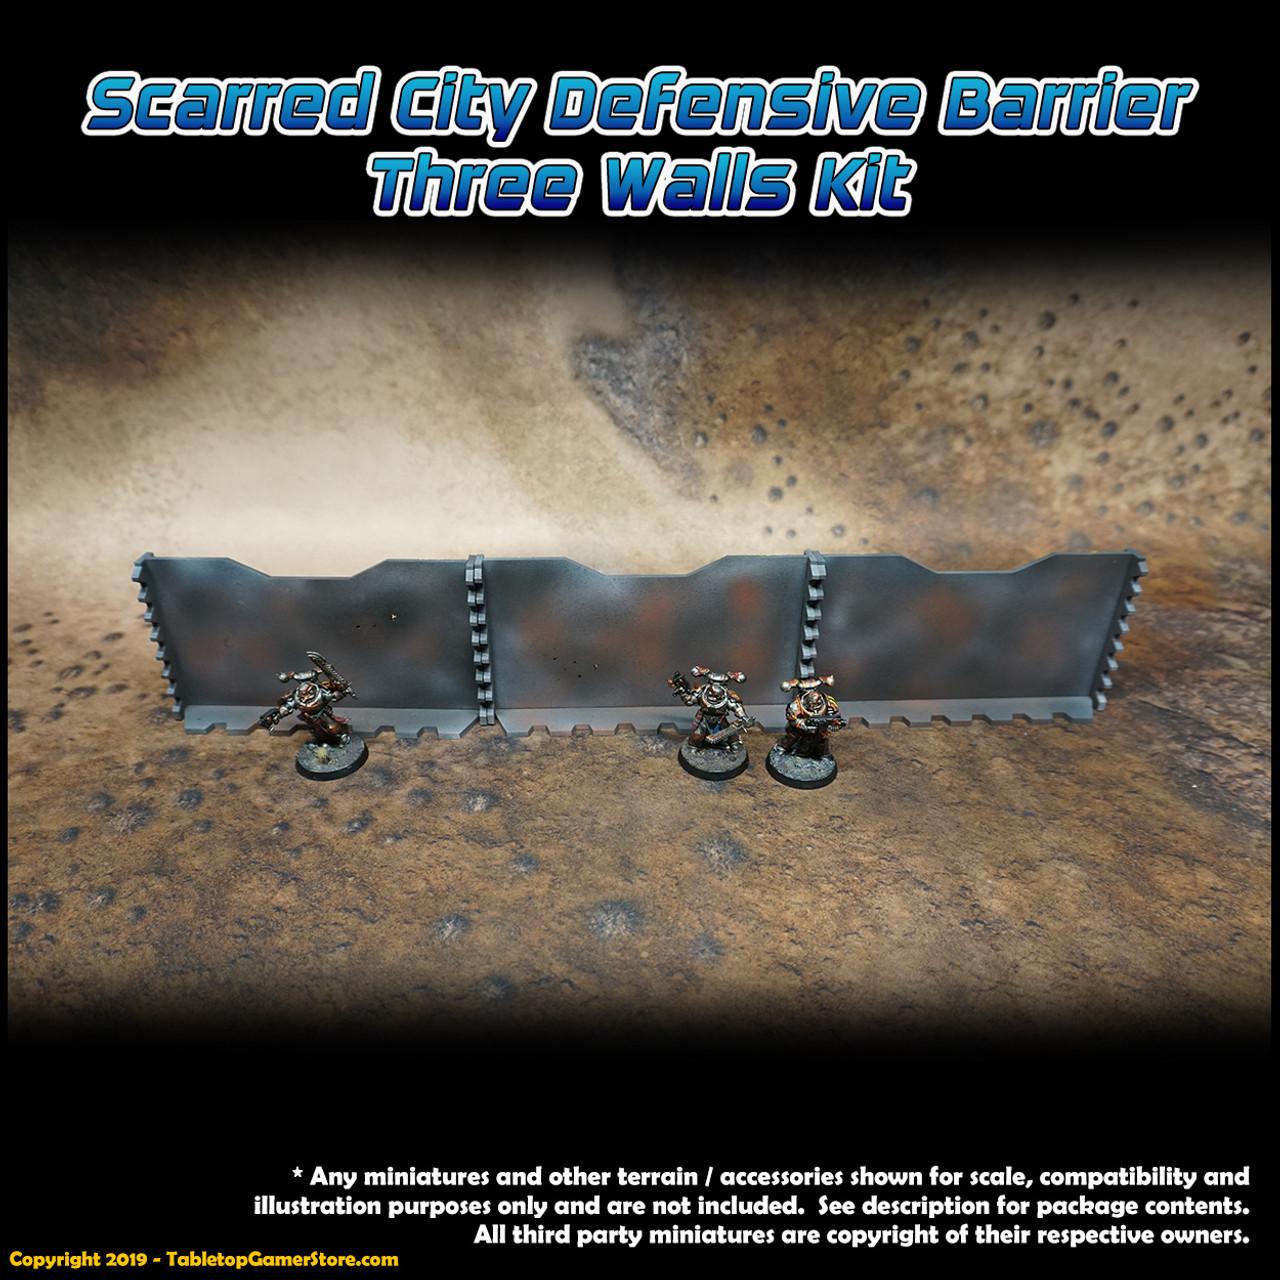 Scarred City Defensive Barrier - 3 Walls Kit